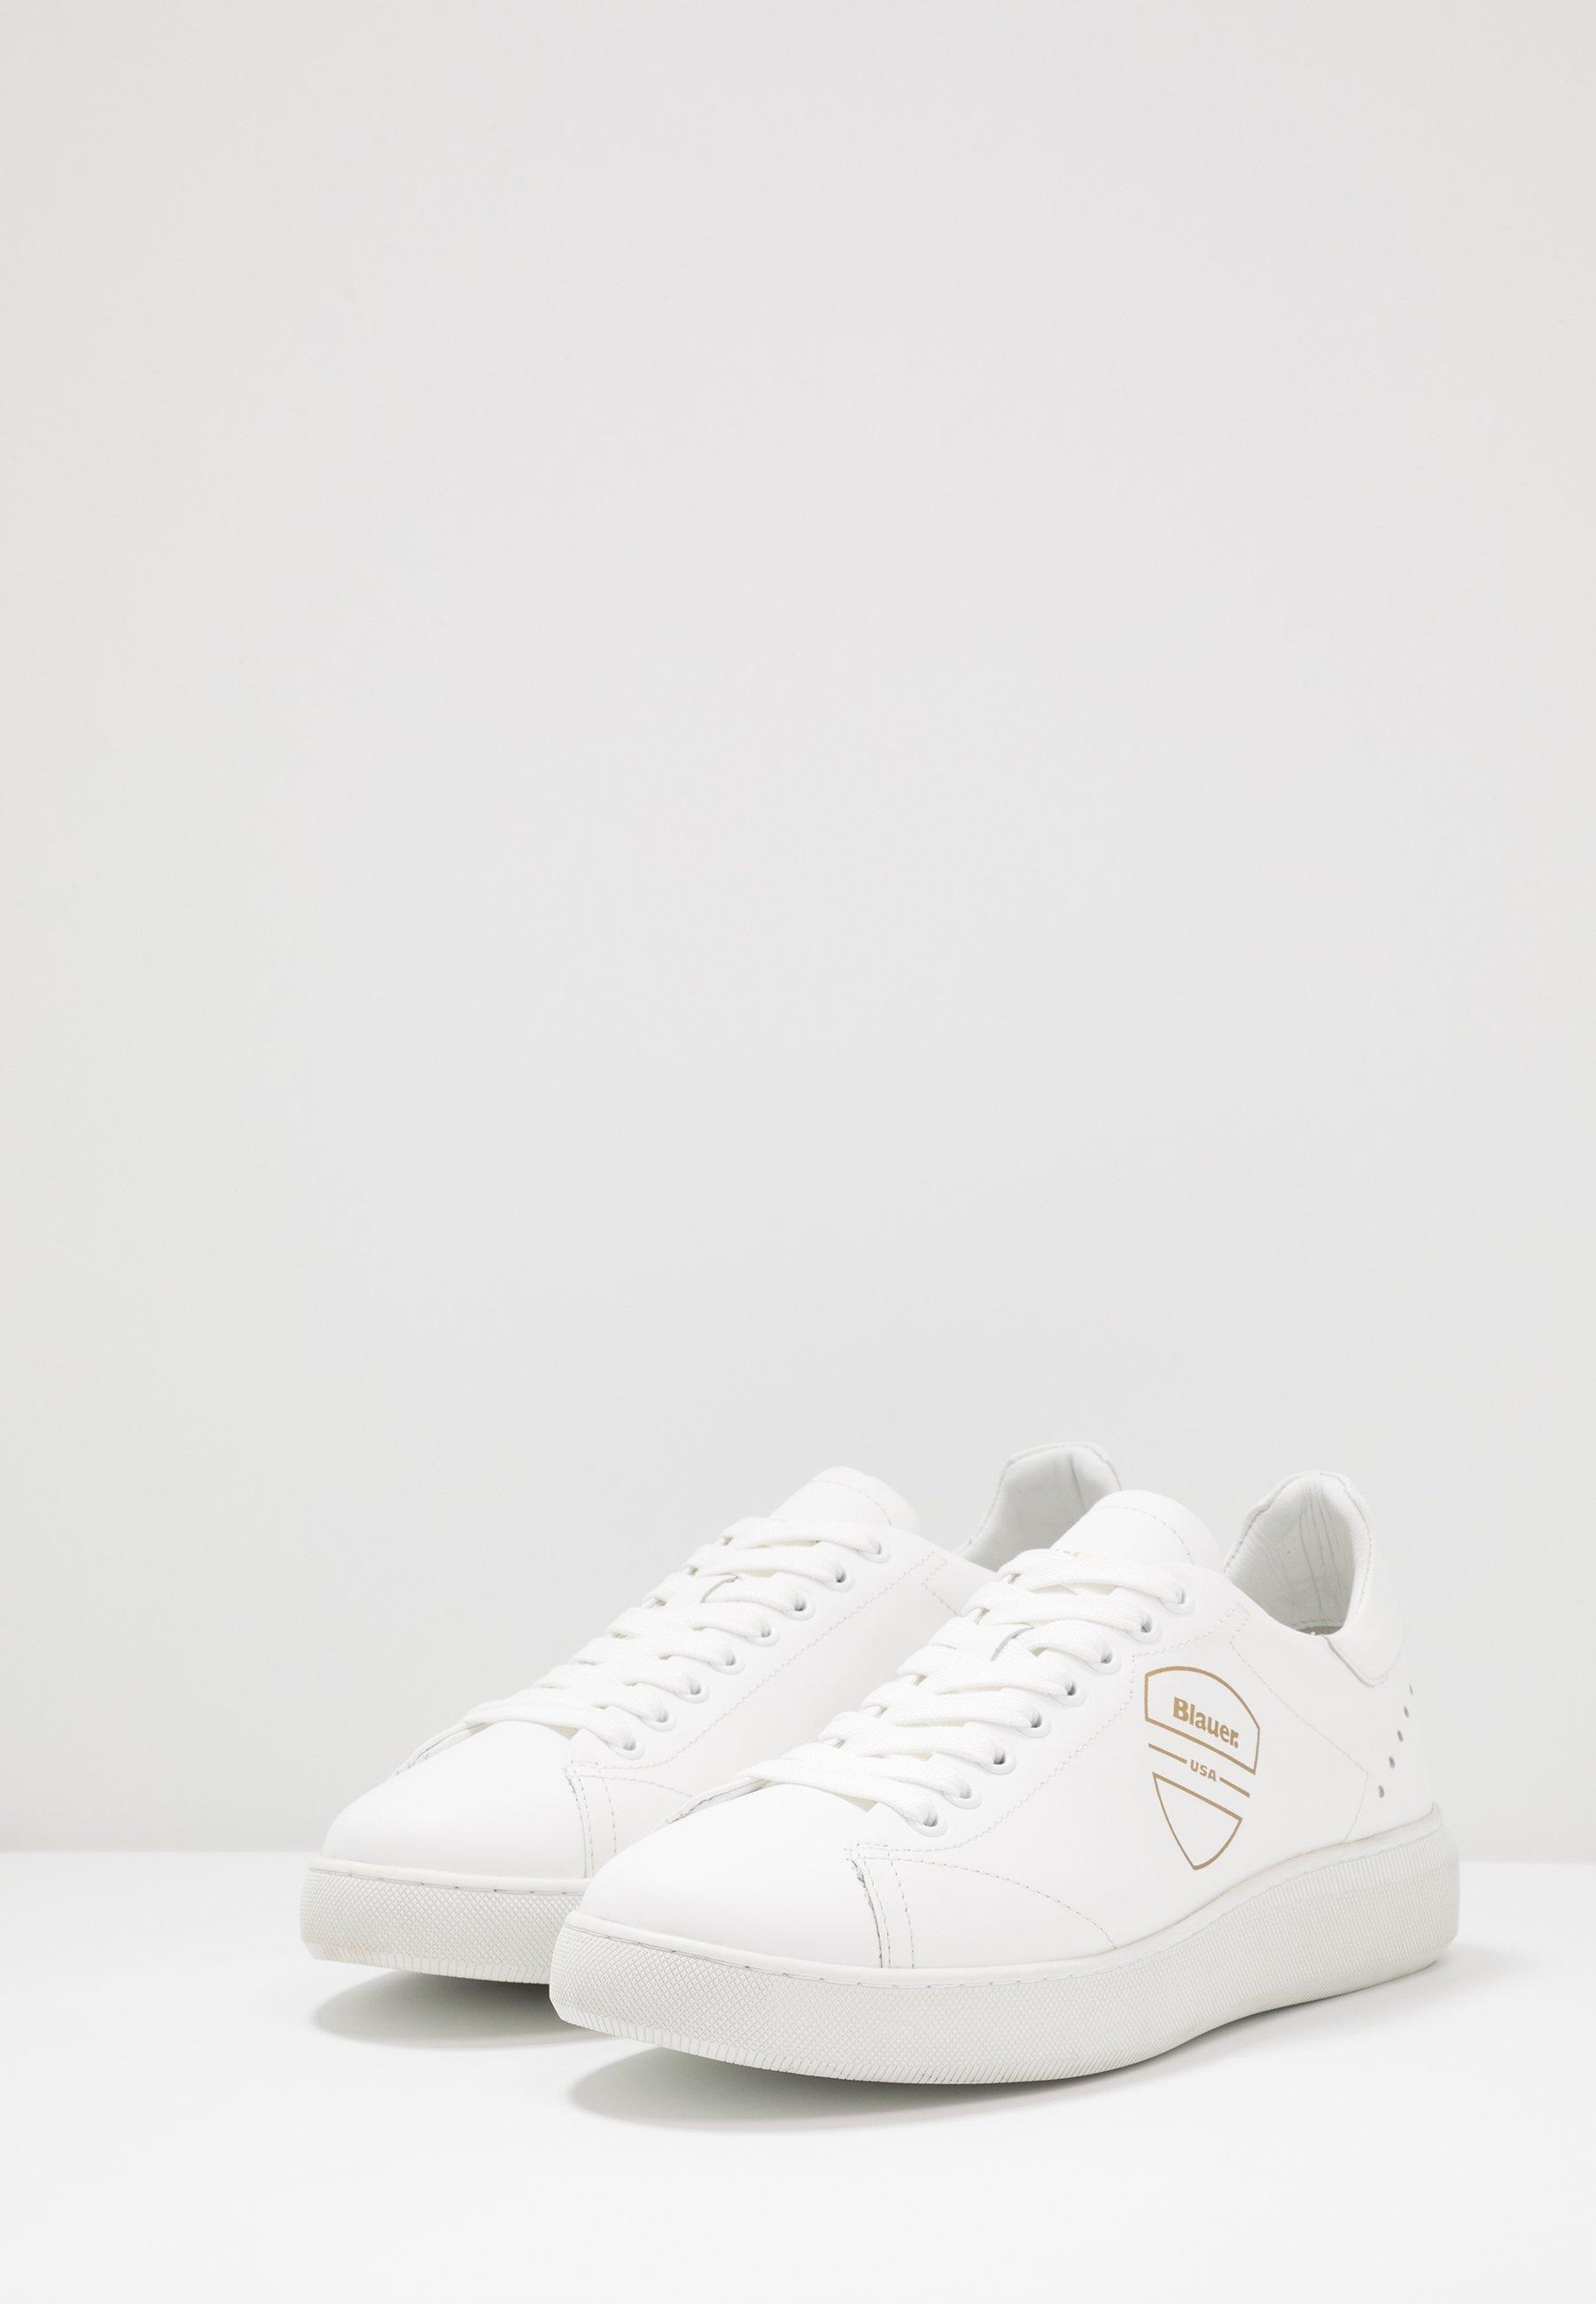 Blauer Keith 02 - Sneakers Basse White 1QXmtYq